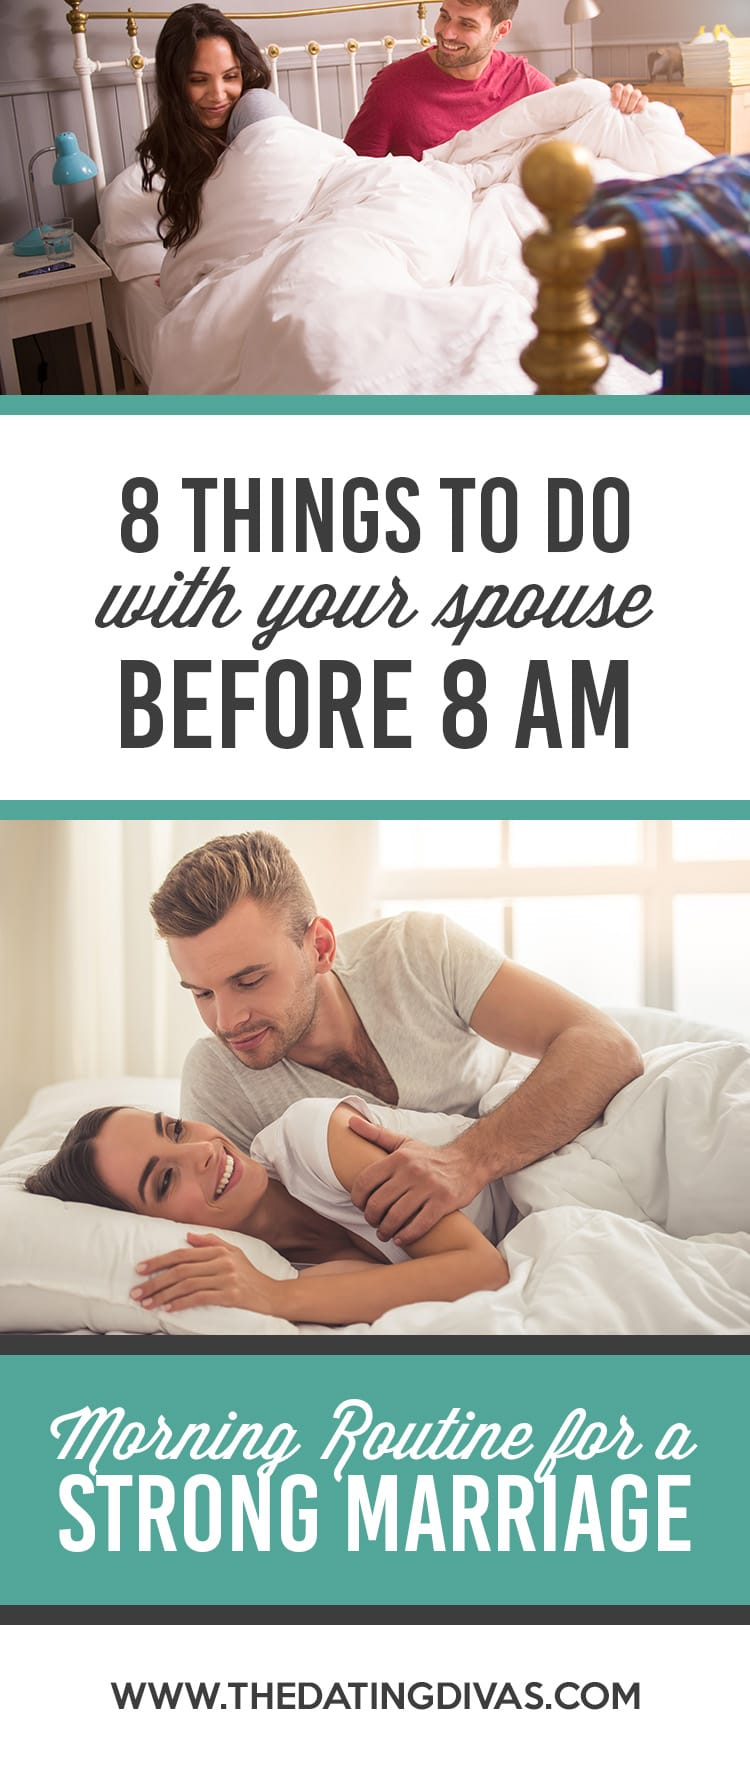 Marriage Morning Routine #marriageadvice #morningroutine